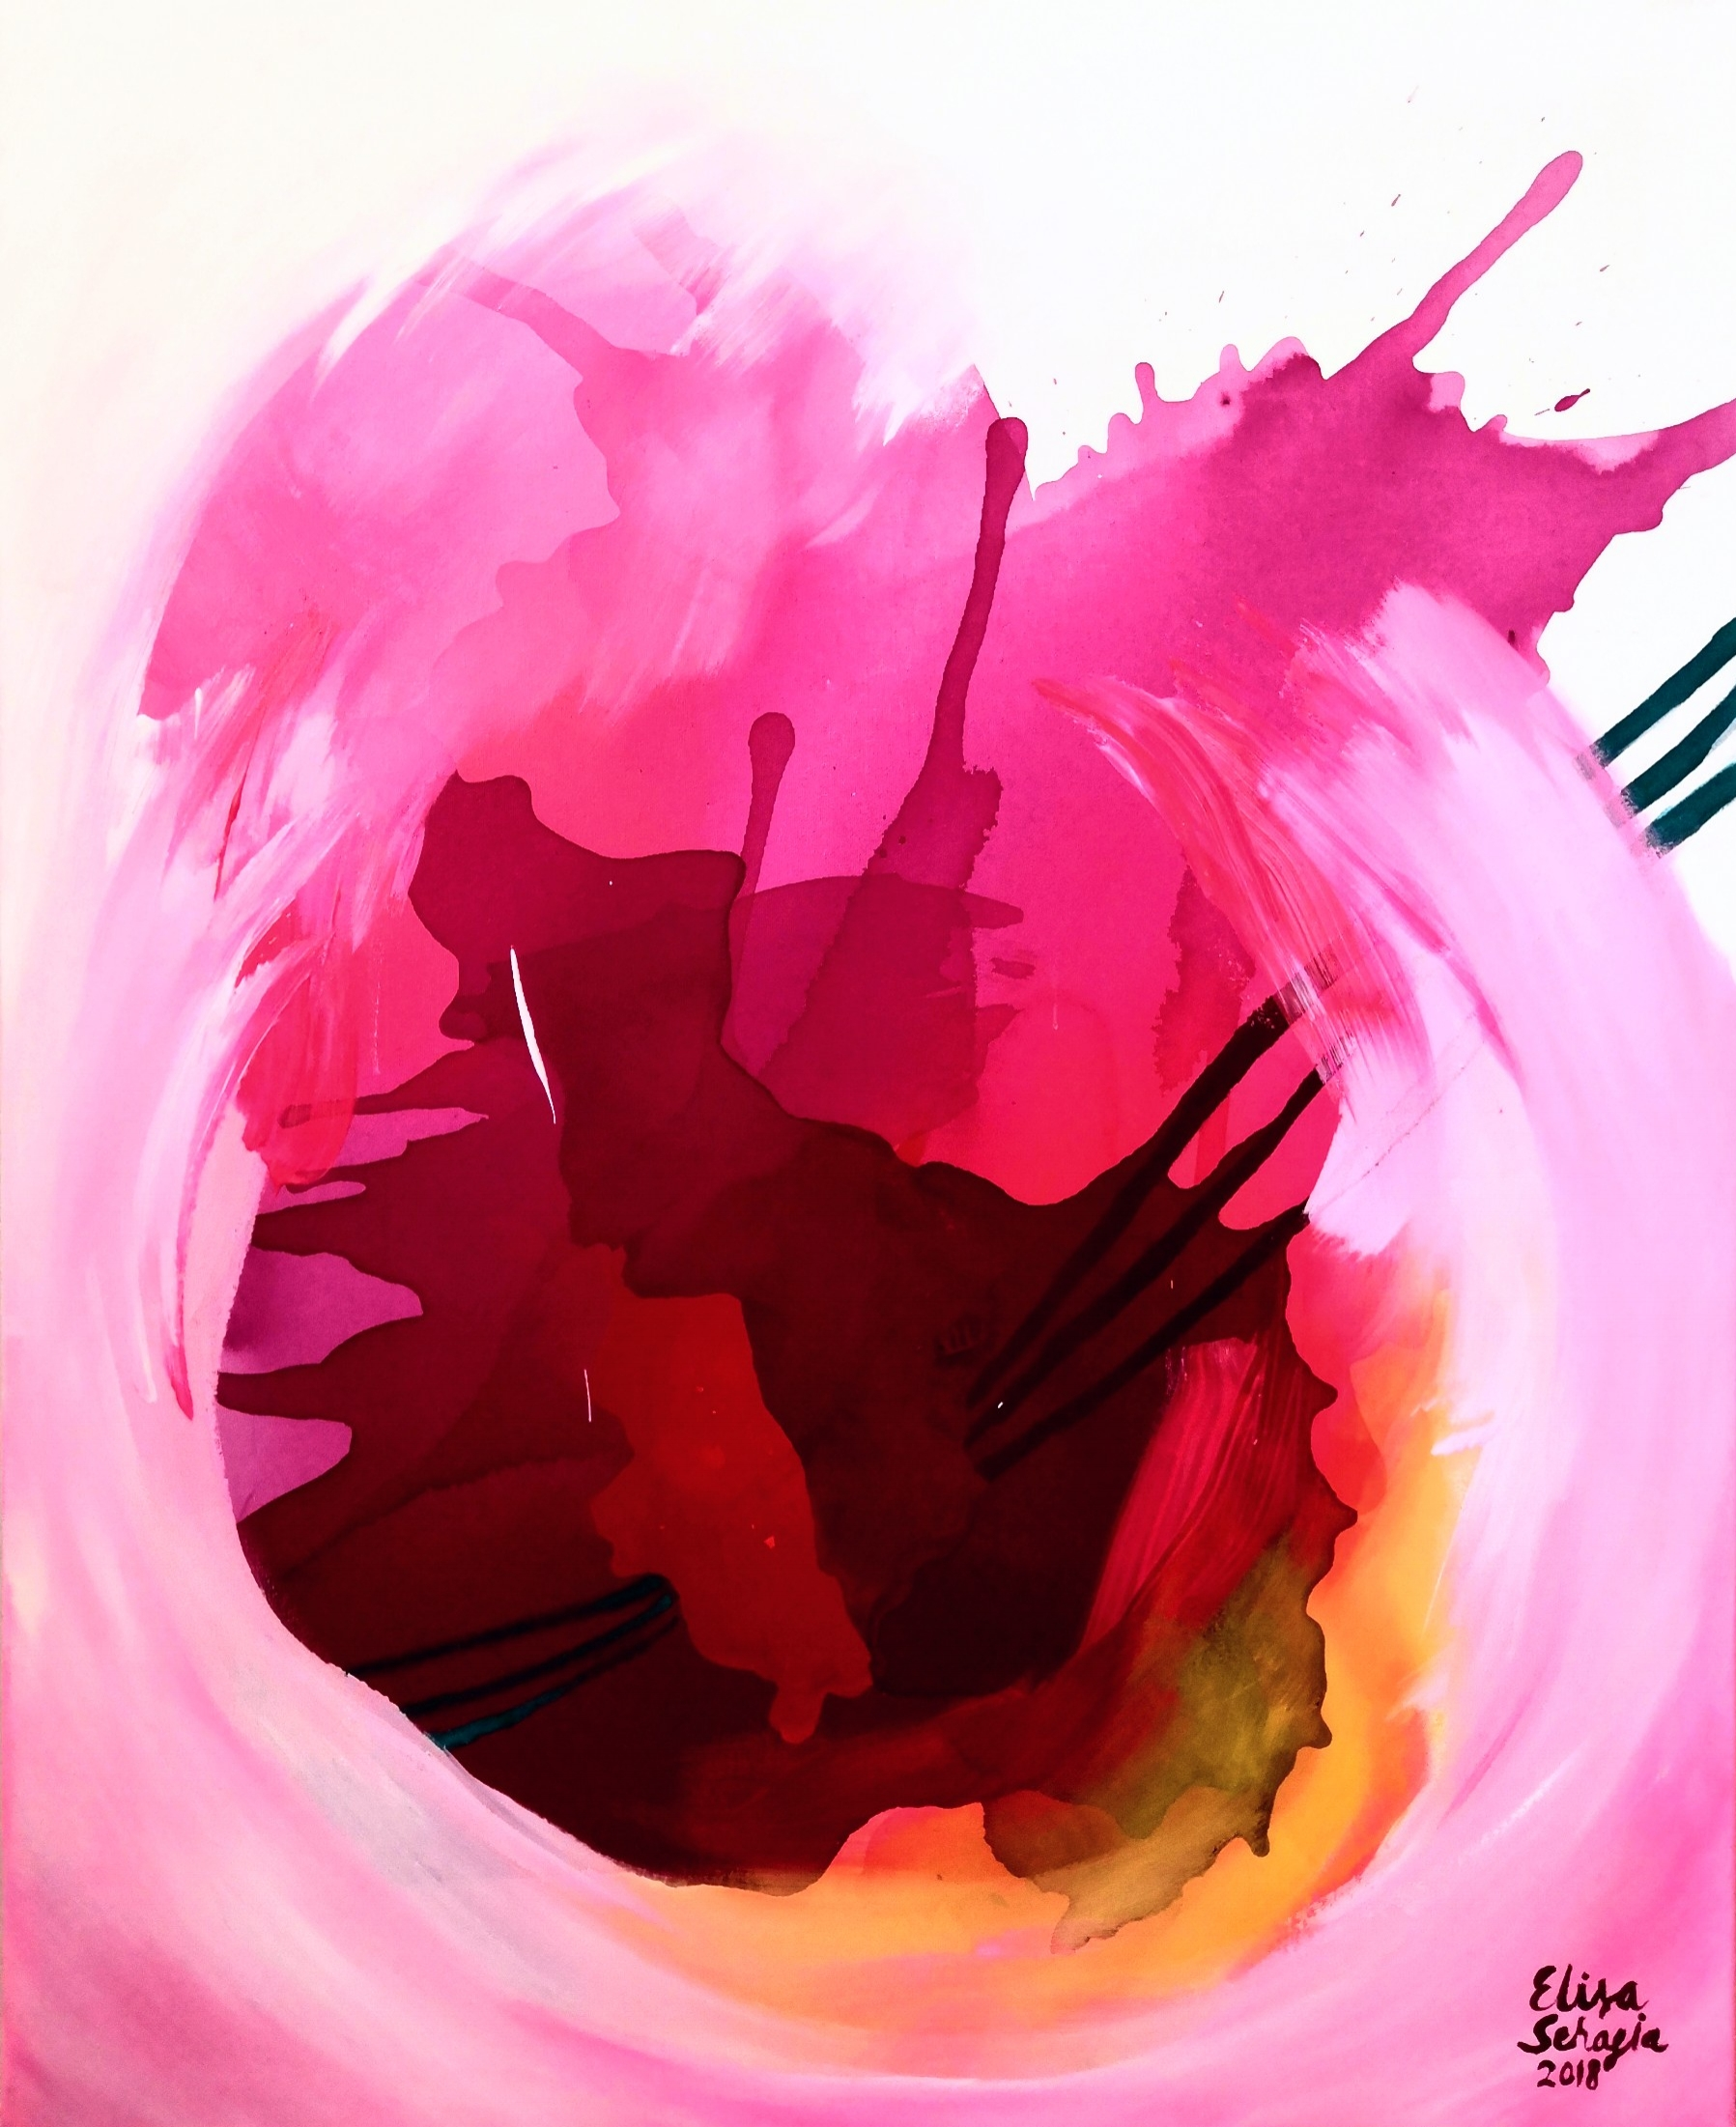 Autumnwine, Akryyli ja pastelli kankaalle, 100 cm x 80 cm  Myyty / Sold